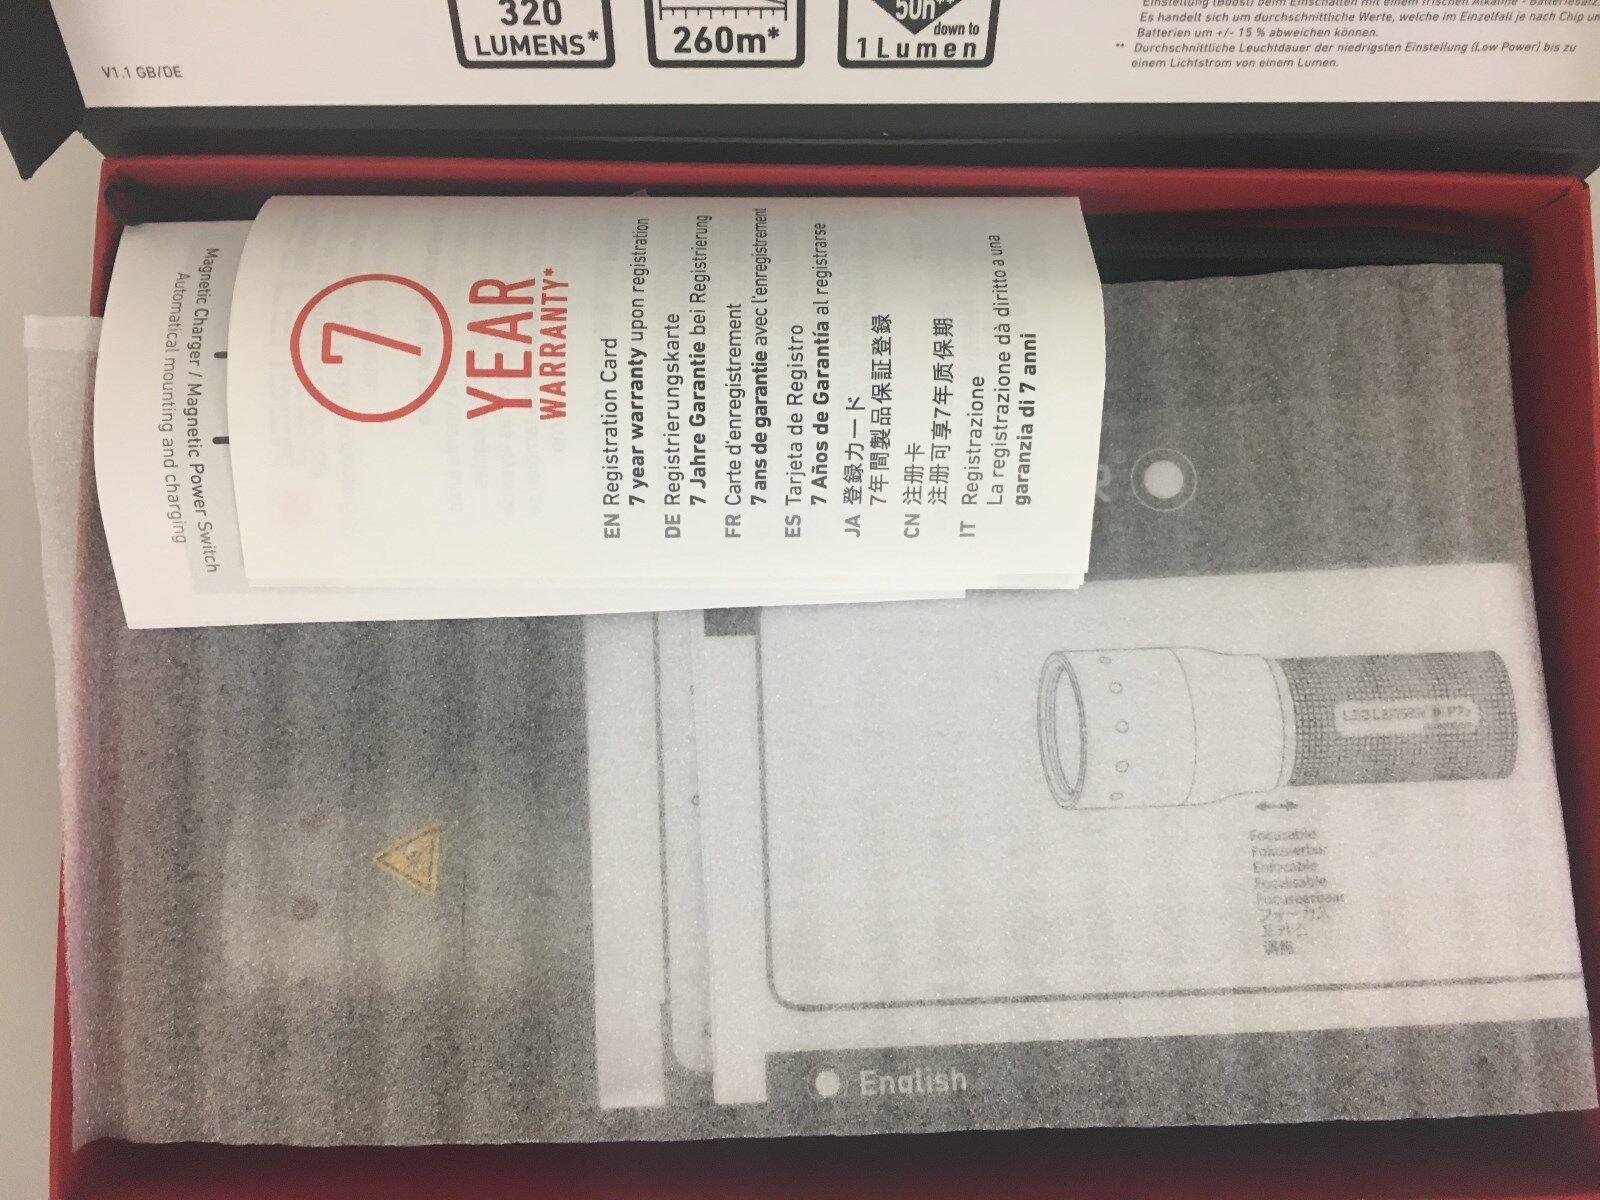 LED LED LED Lenser B 7.2 incl Universalhalterung - Geschenkbox 986522